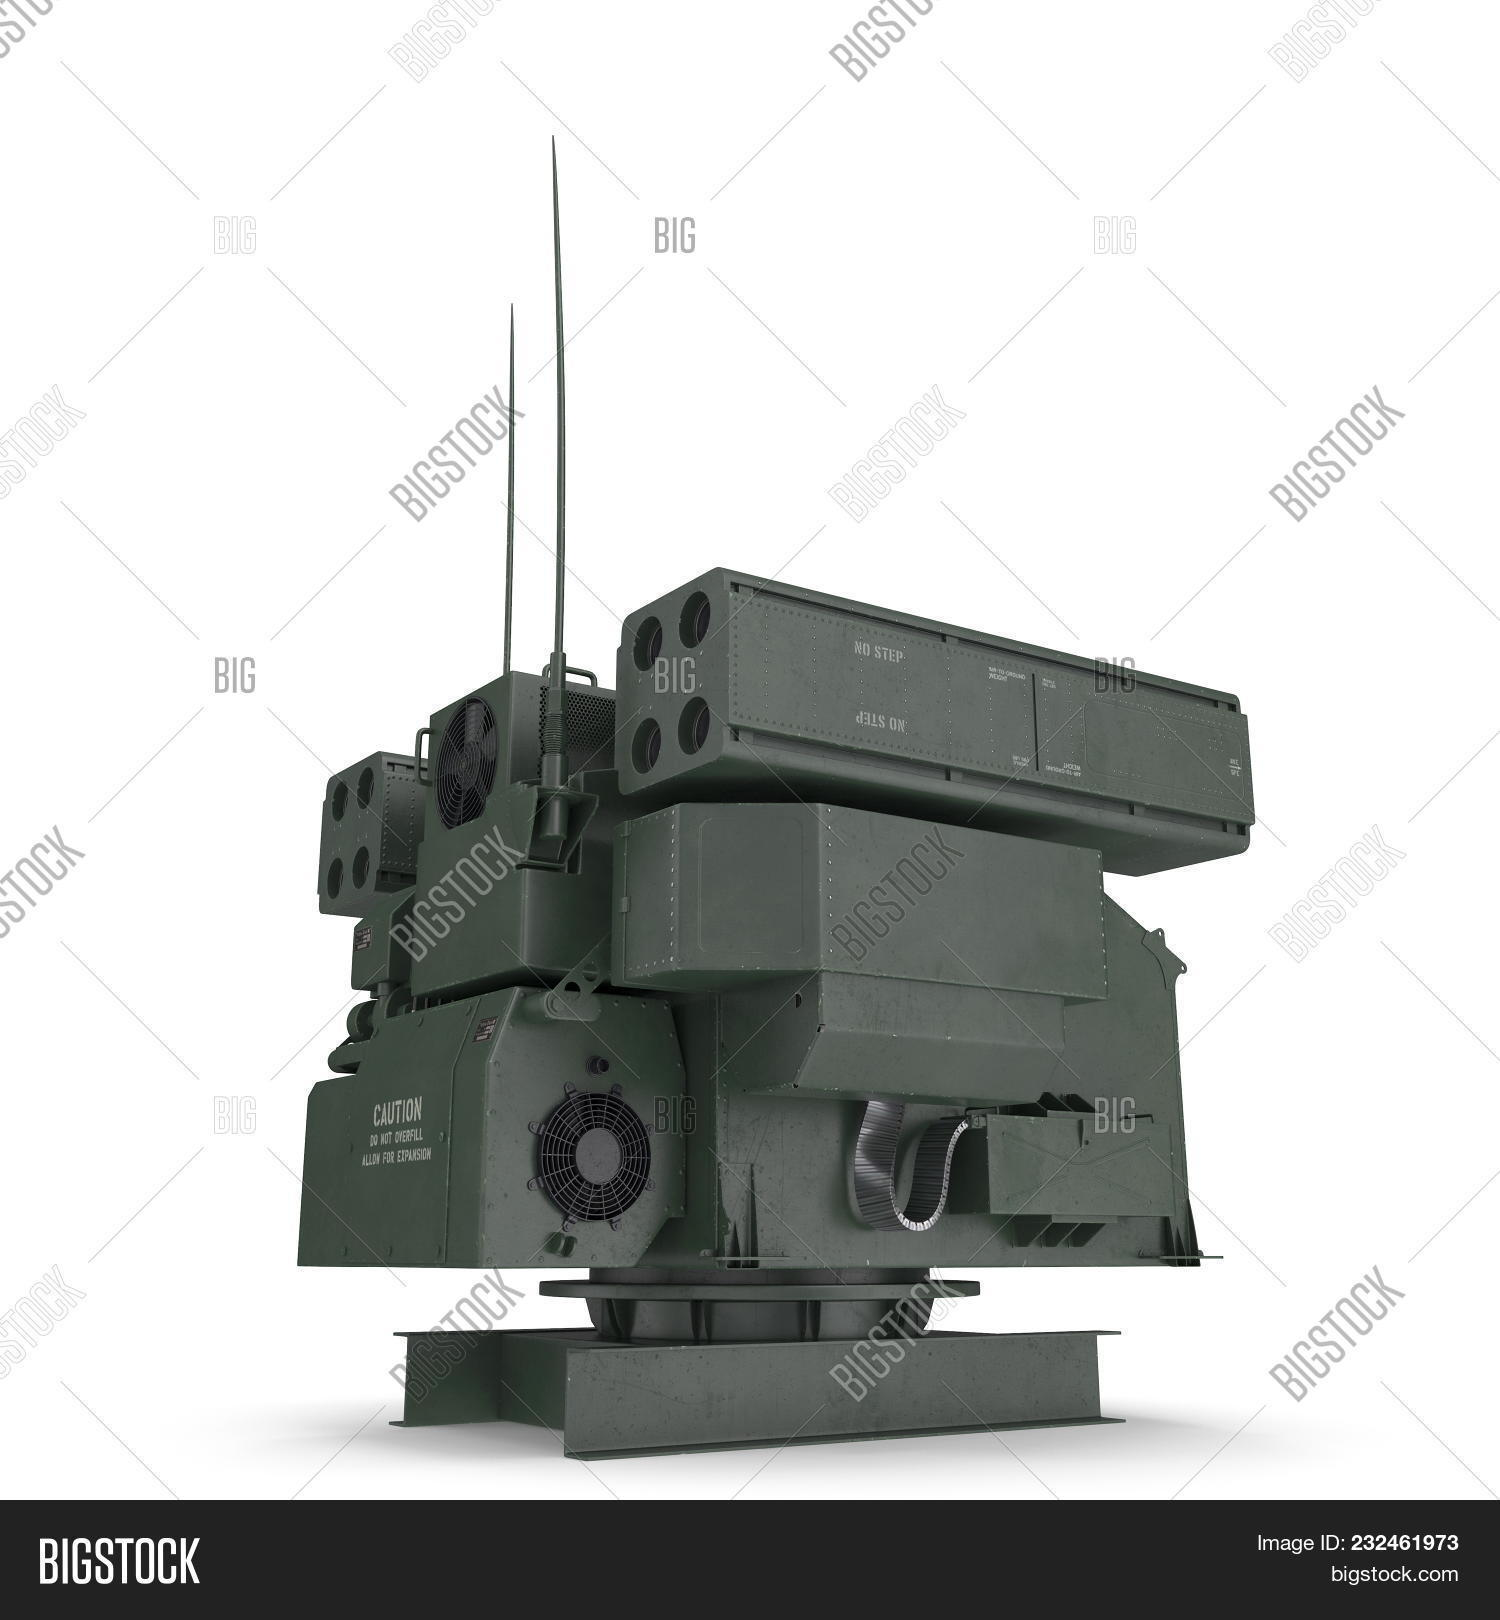 Avenger Air Defense Image & Photo (Free Trial) | Bigstock